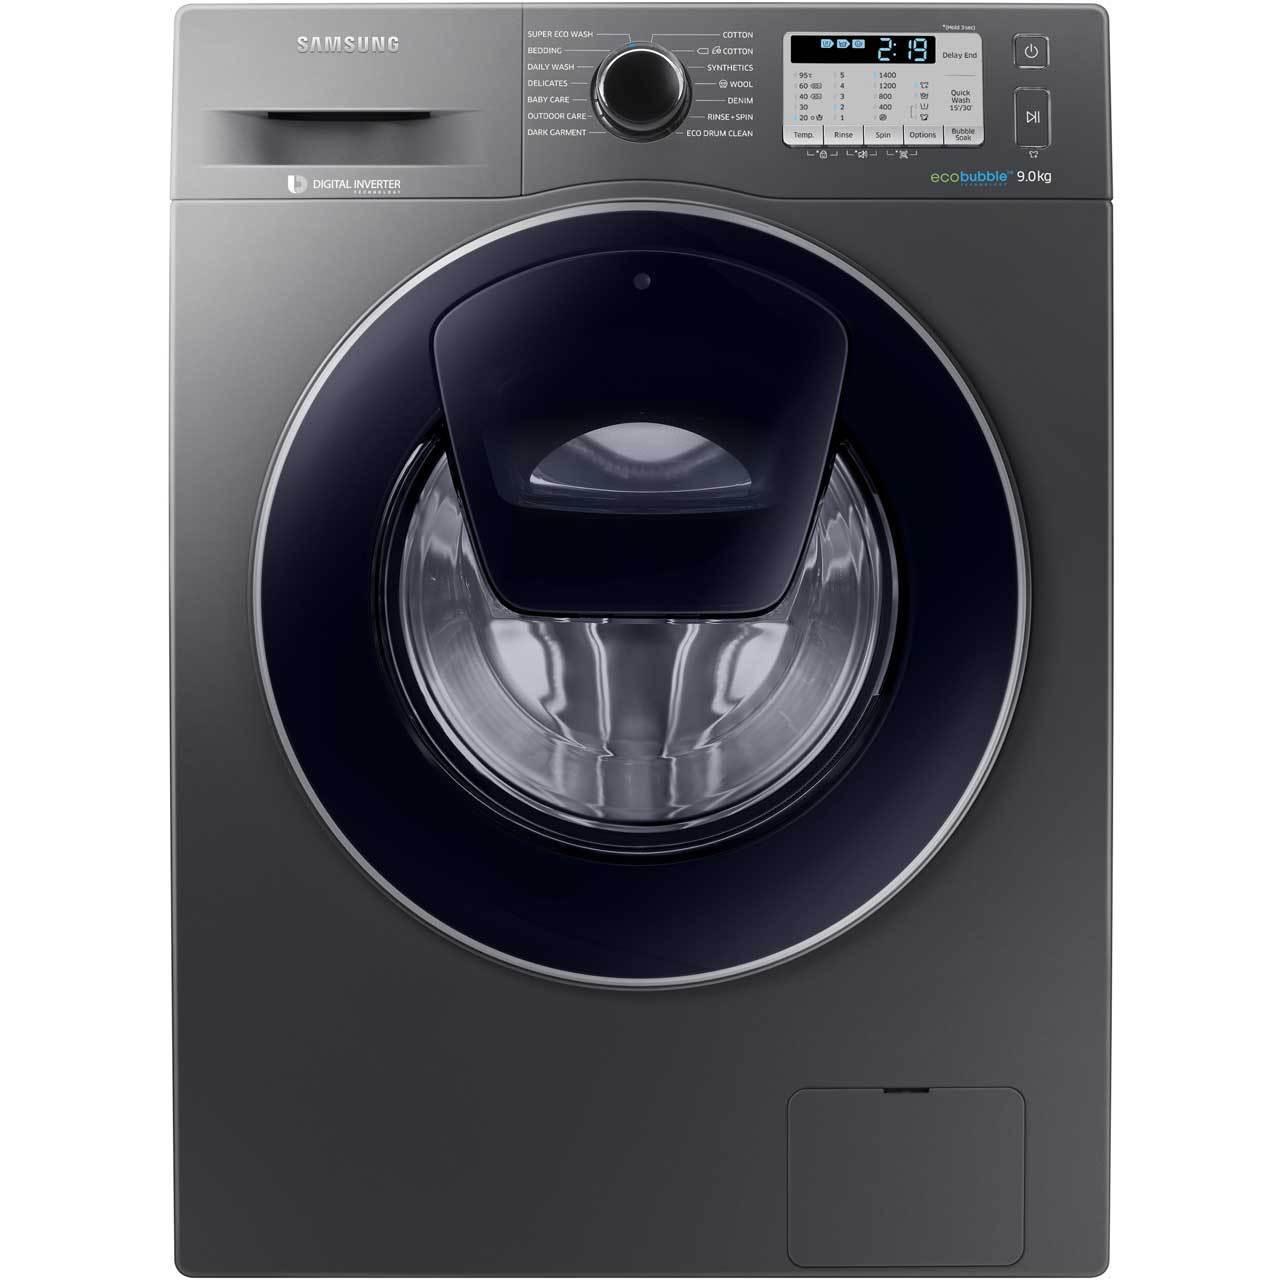 Samsung WW90K5413UX ecobubble AddWash A+++ 9Kg 1400 RPM Washing £359.20 at AO on eBay